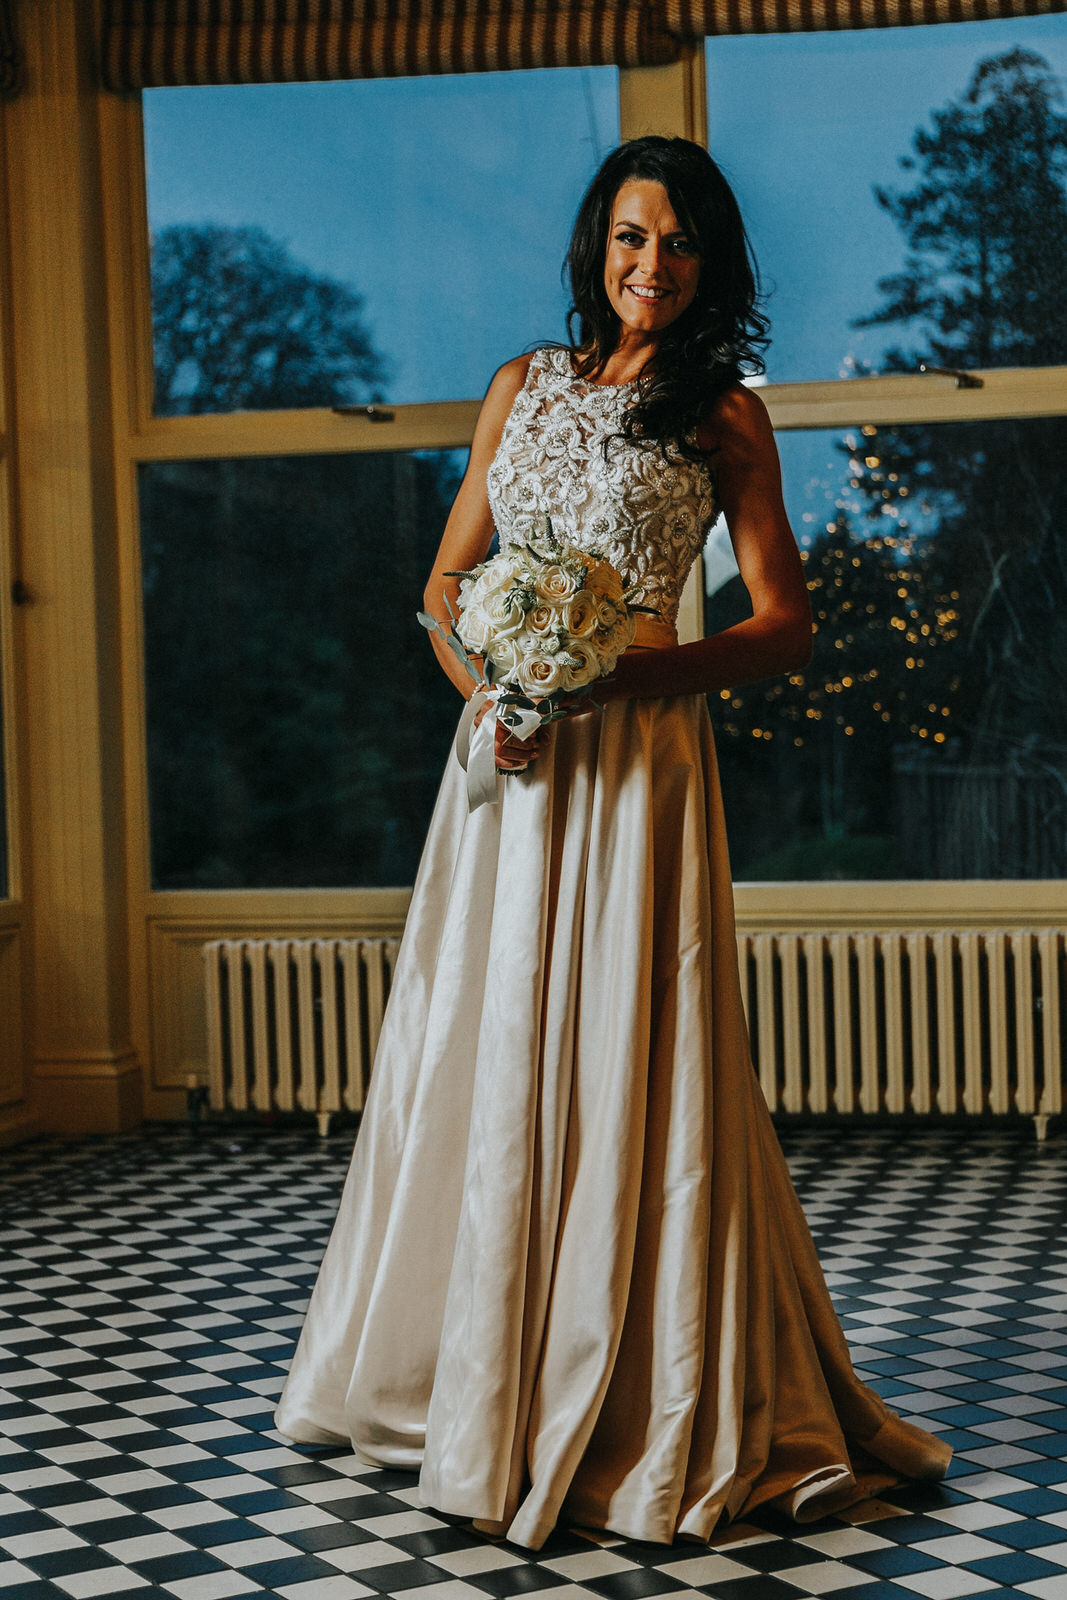 Roger_Kenny_wedding_photographer_474.jpg